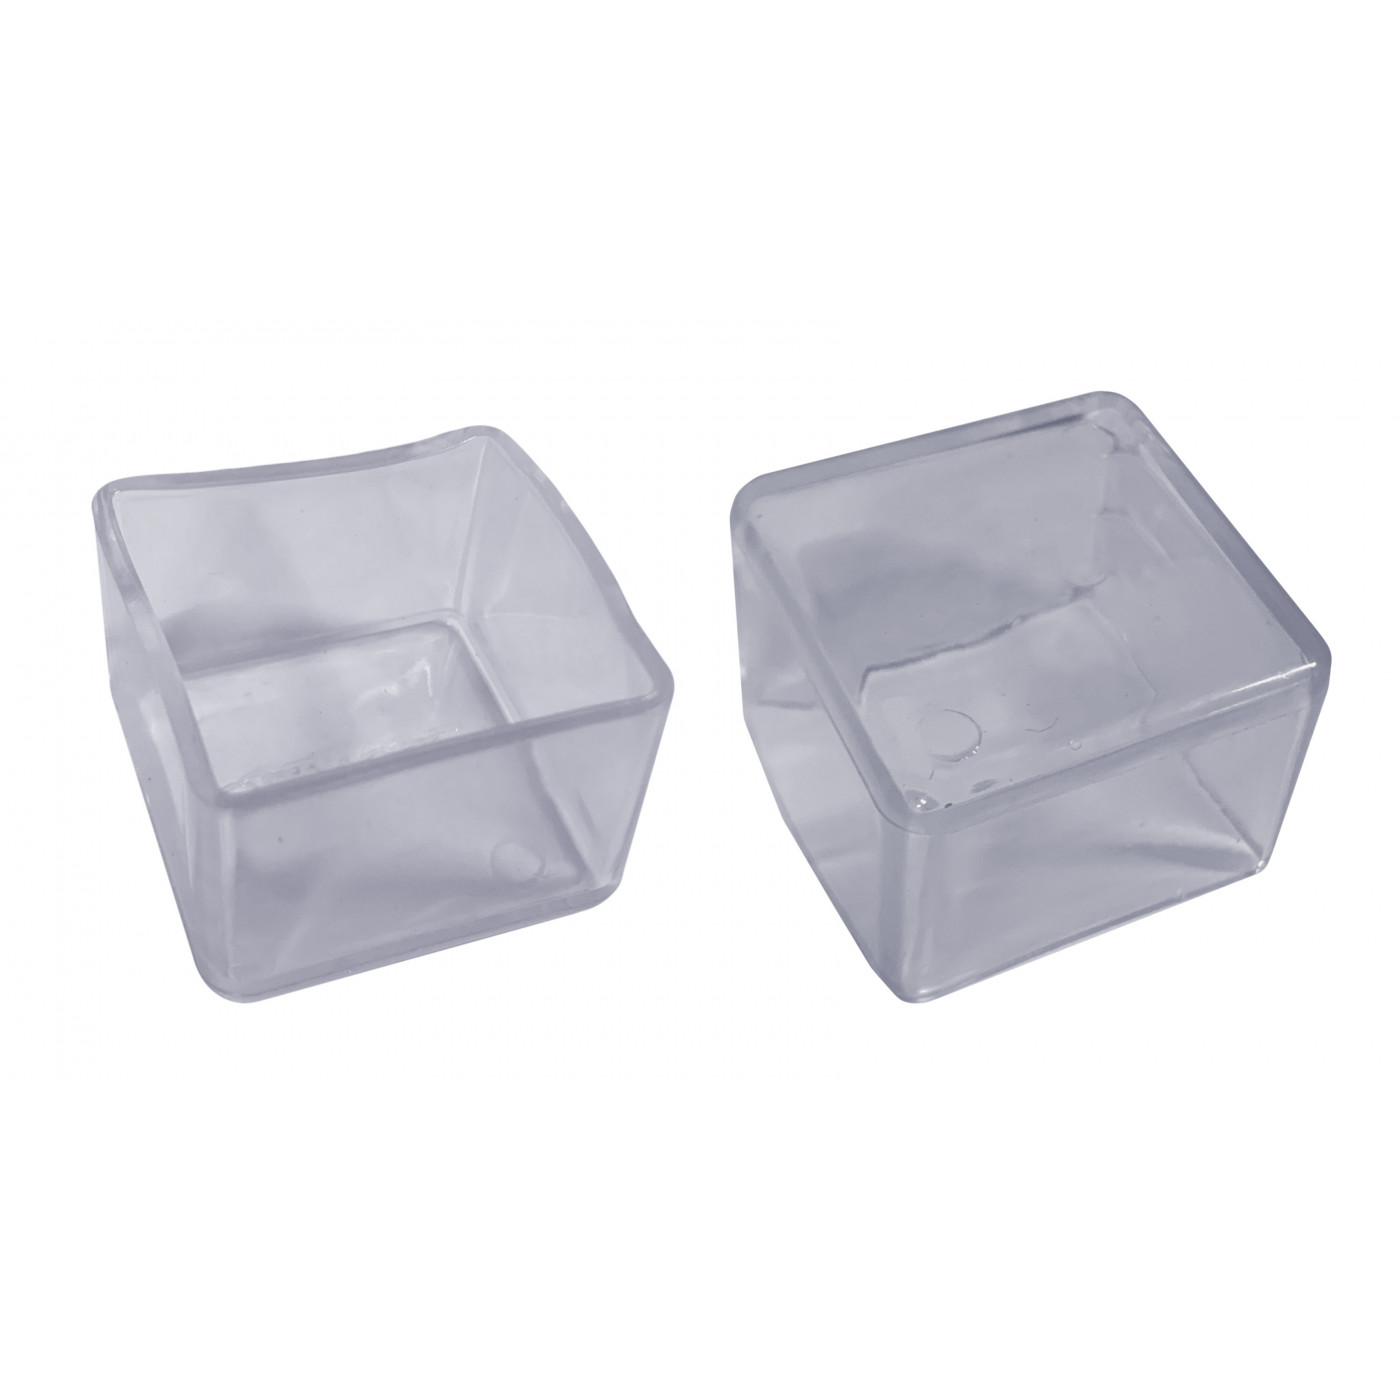 Set von 32 silikonkappen (Außenkappe, Quadrat, 30 mm, transparent) [O-SQ-30-T]  - 1